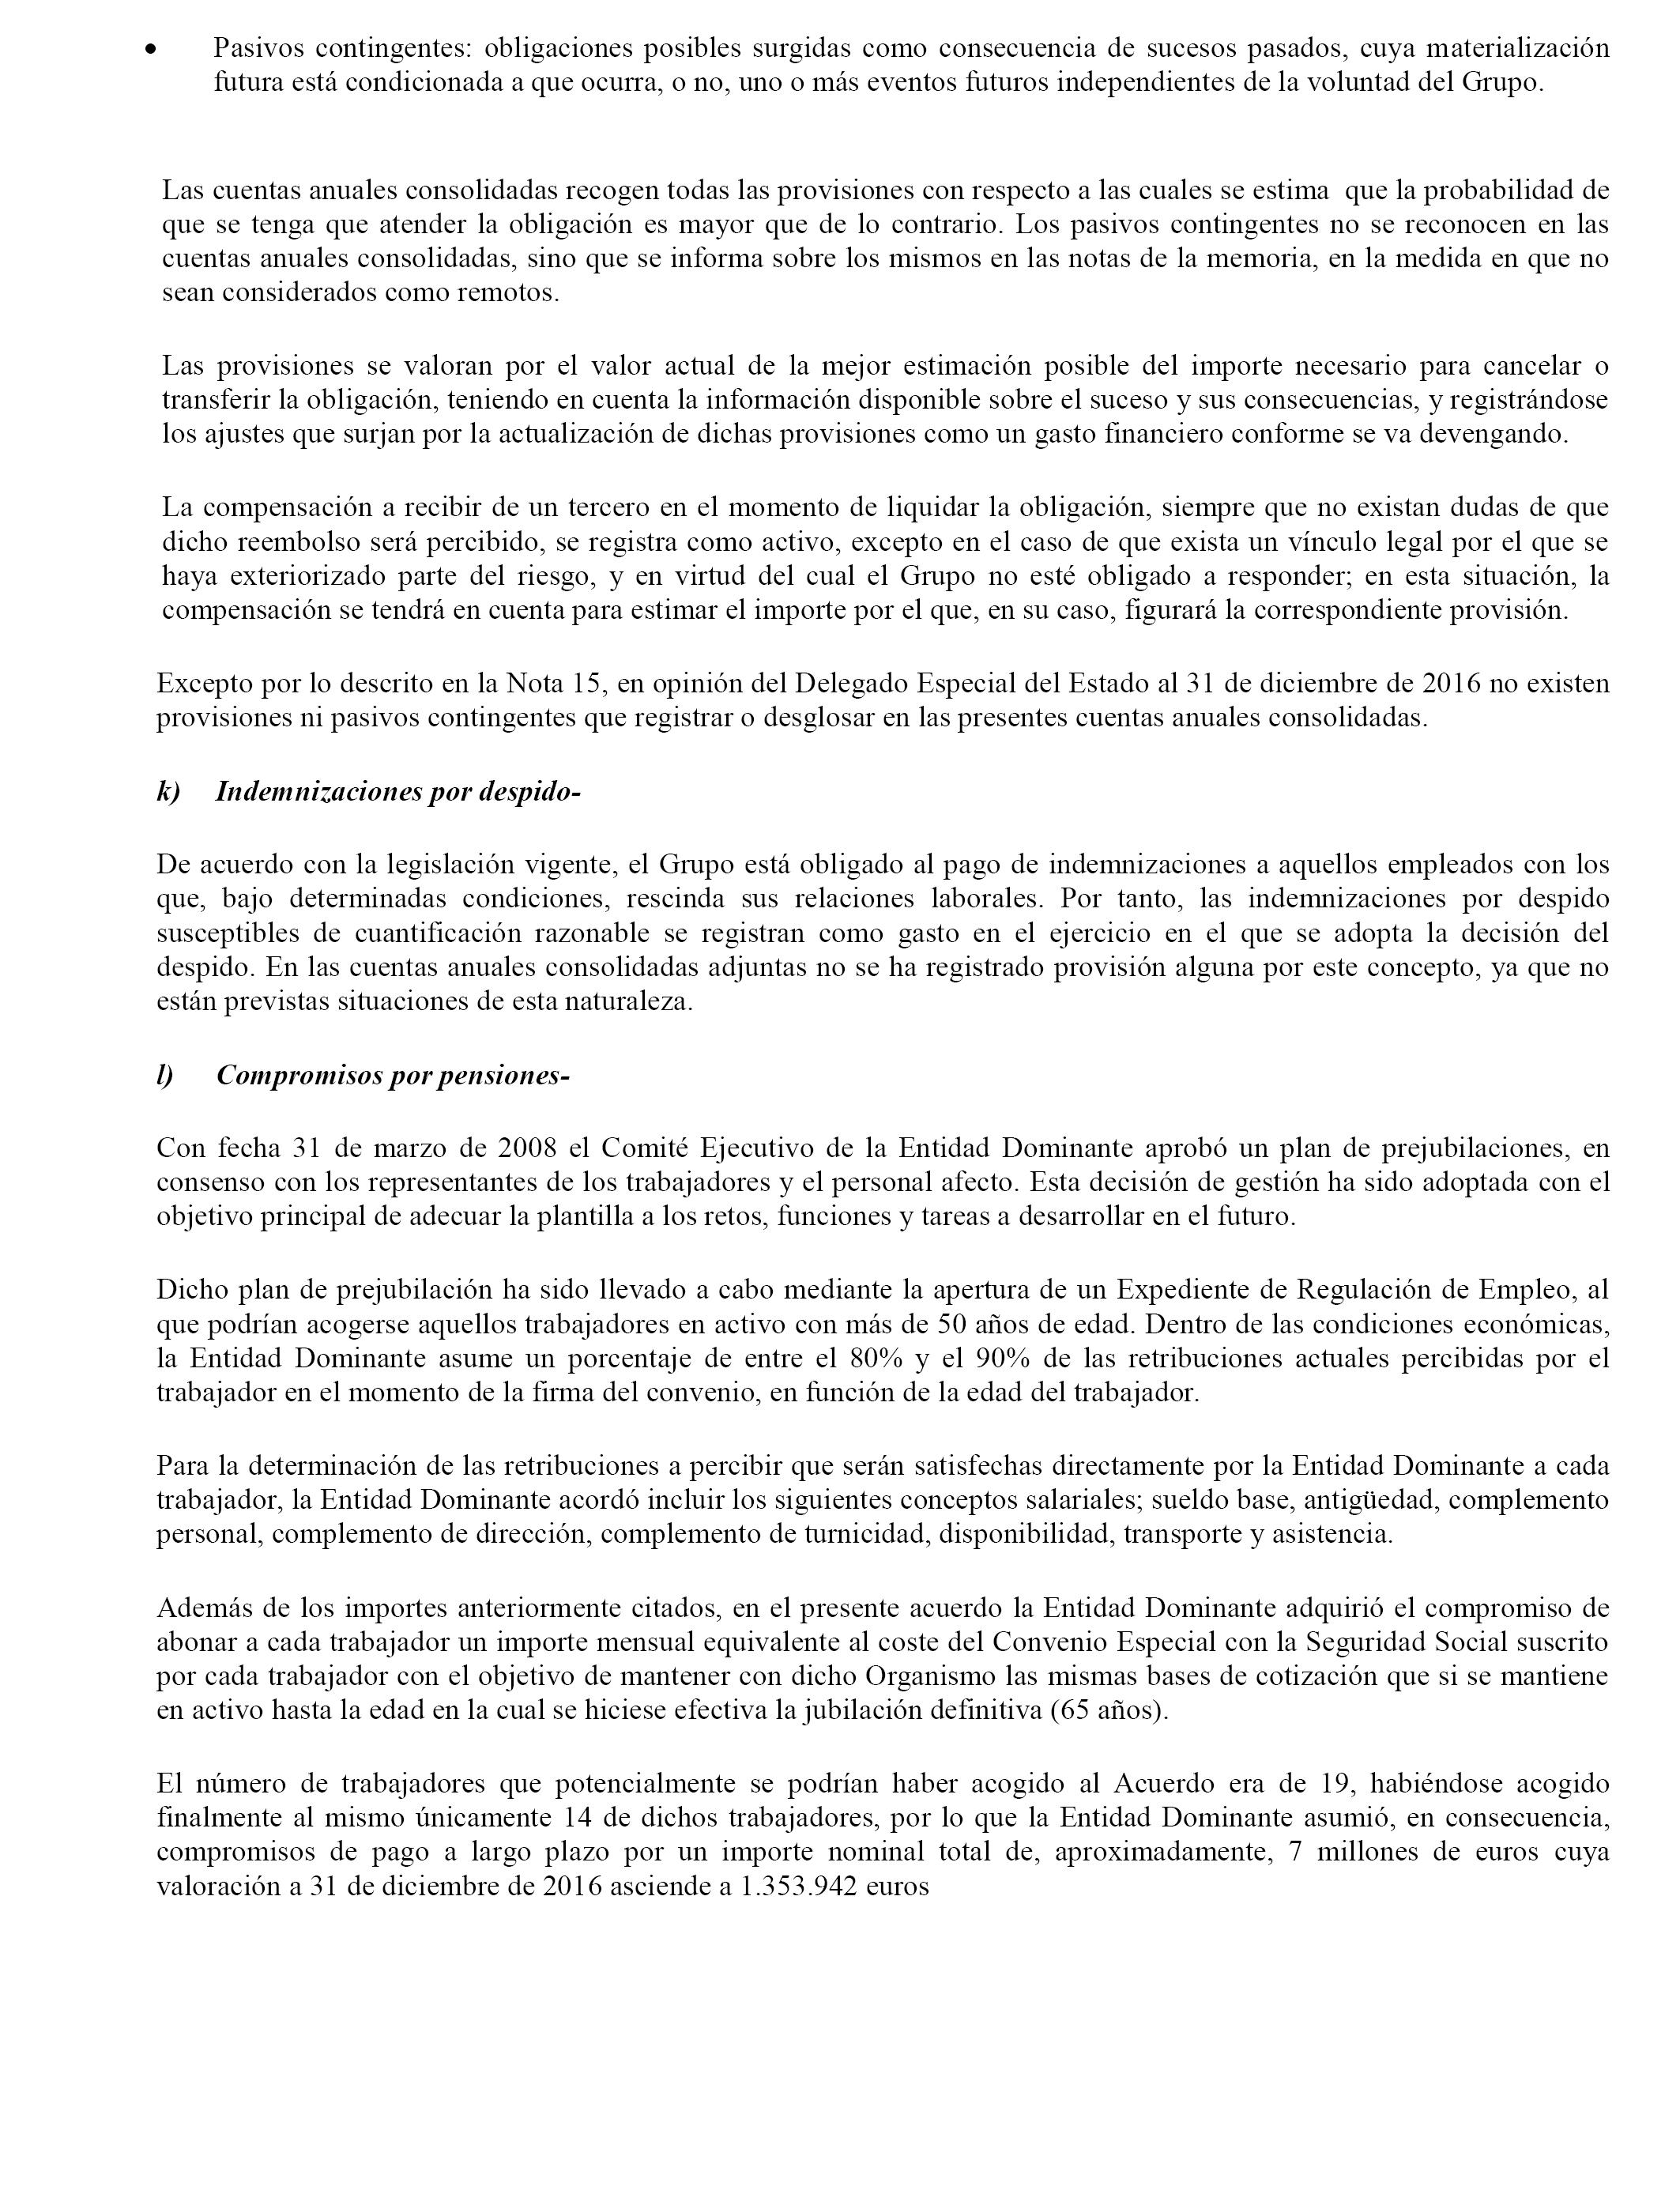 BOE.es - Documento BOE-A-2017-14983